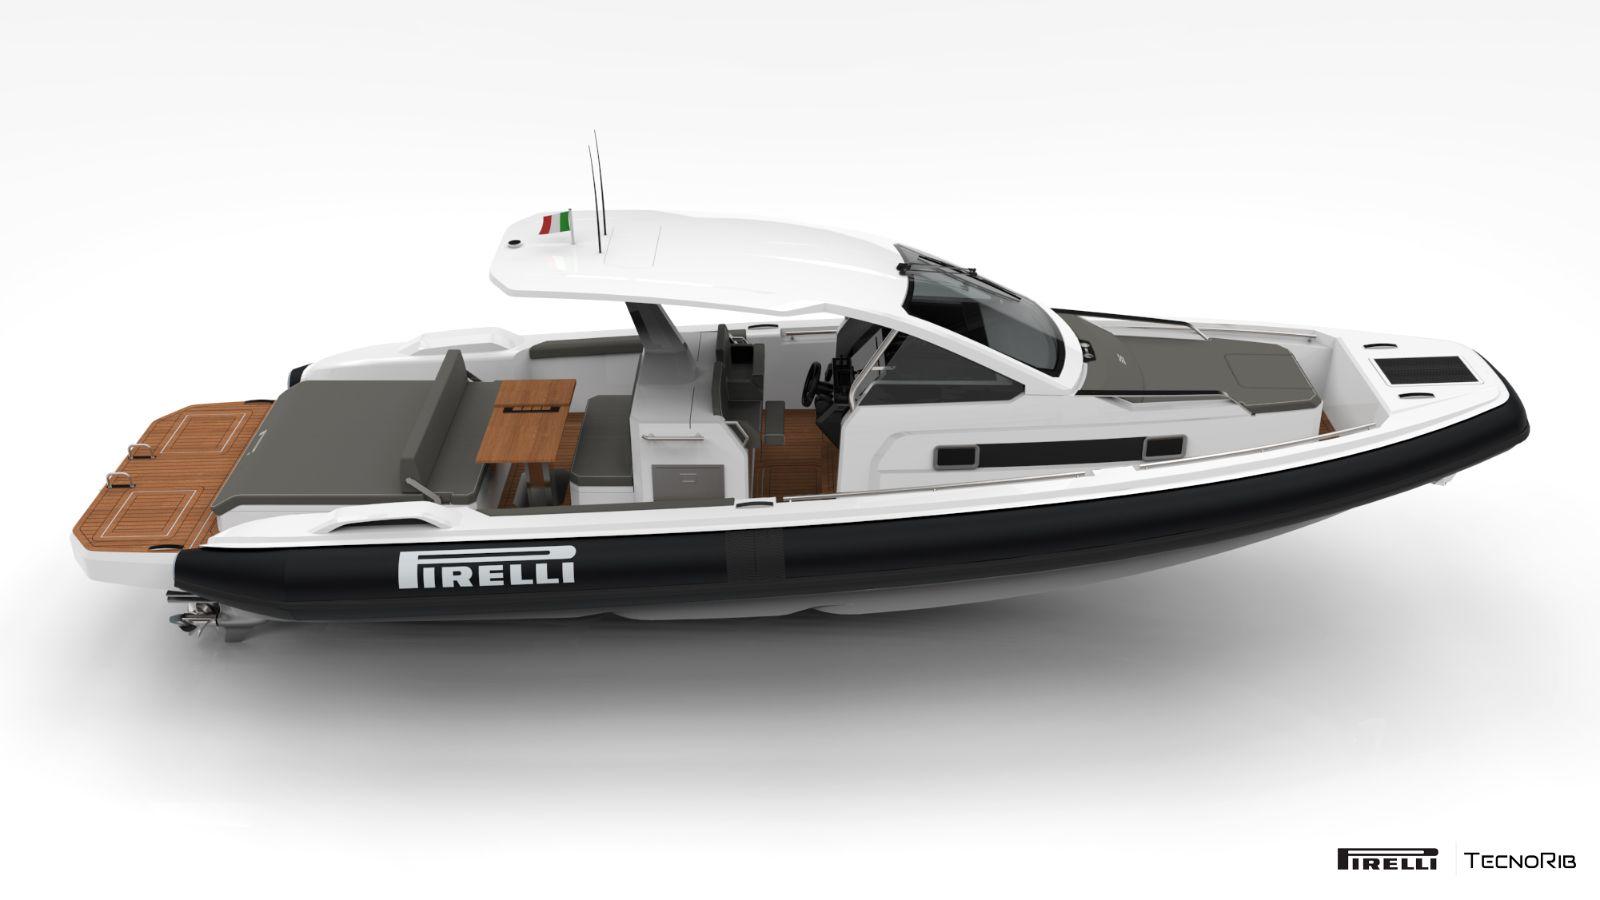 pirelli-35-2